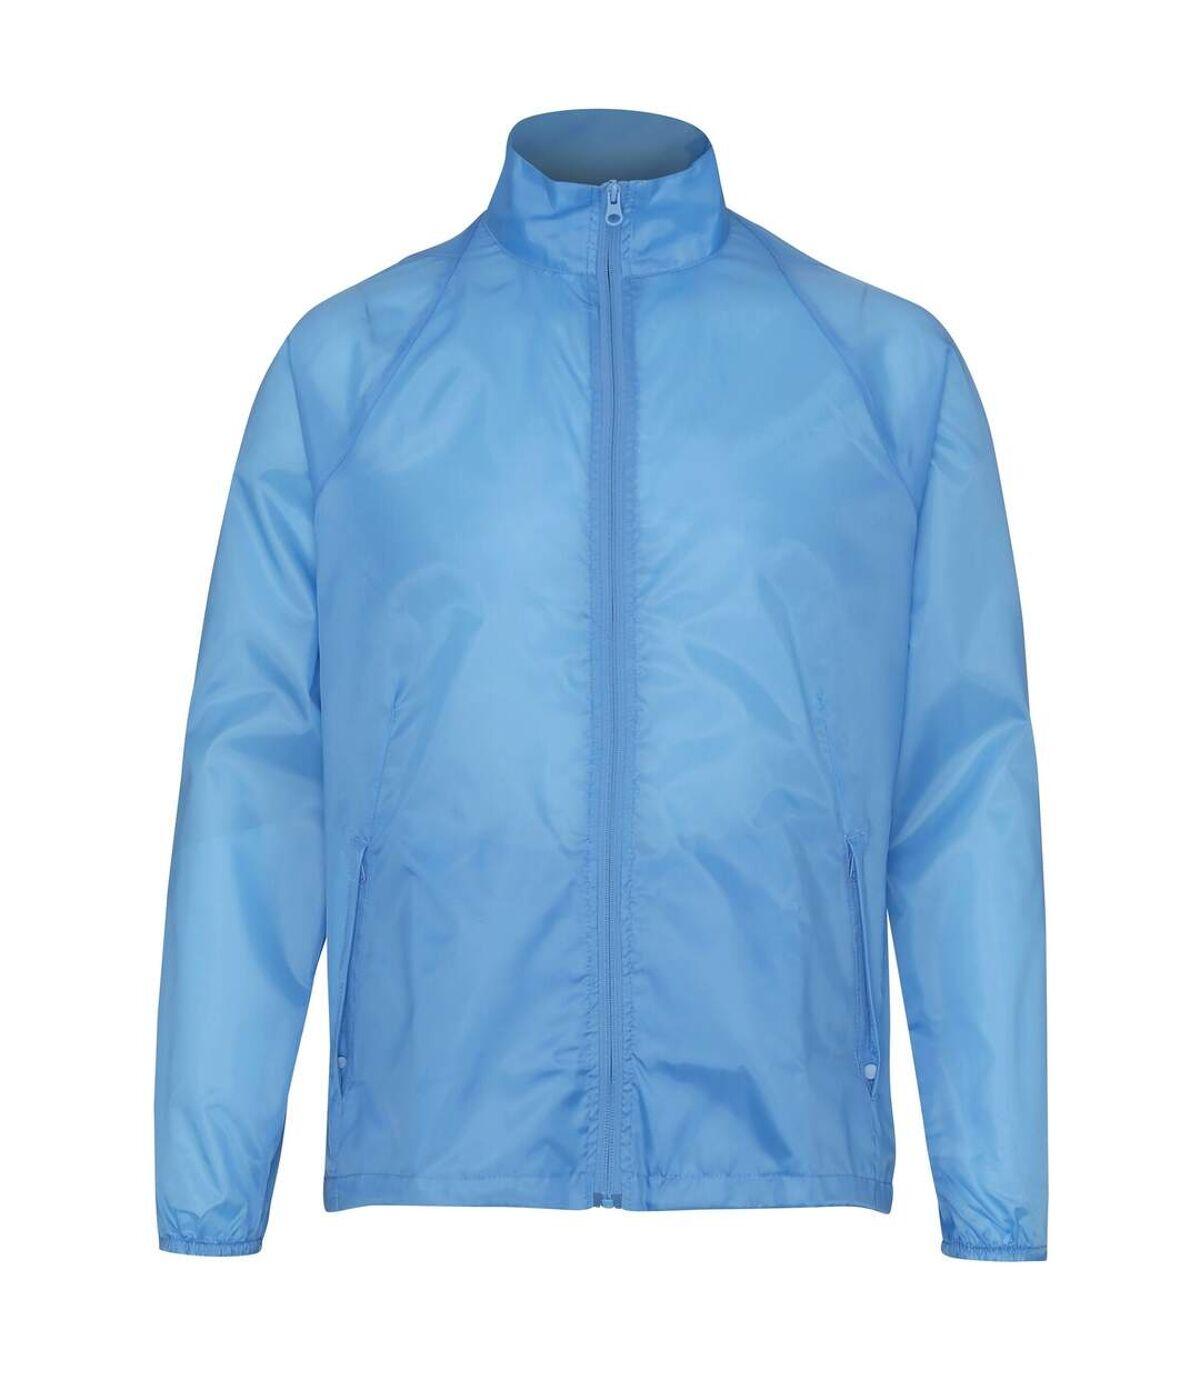 2786 Unisex Lightweight Plain Wind & Shower Resistant Jacket (Sky) - UTRW2500